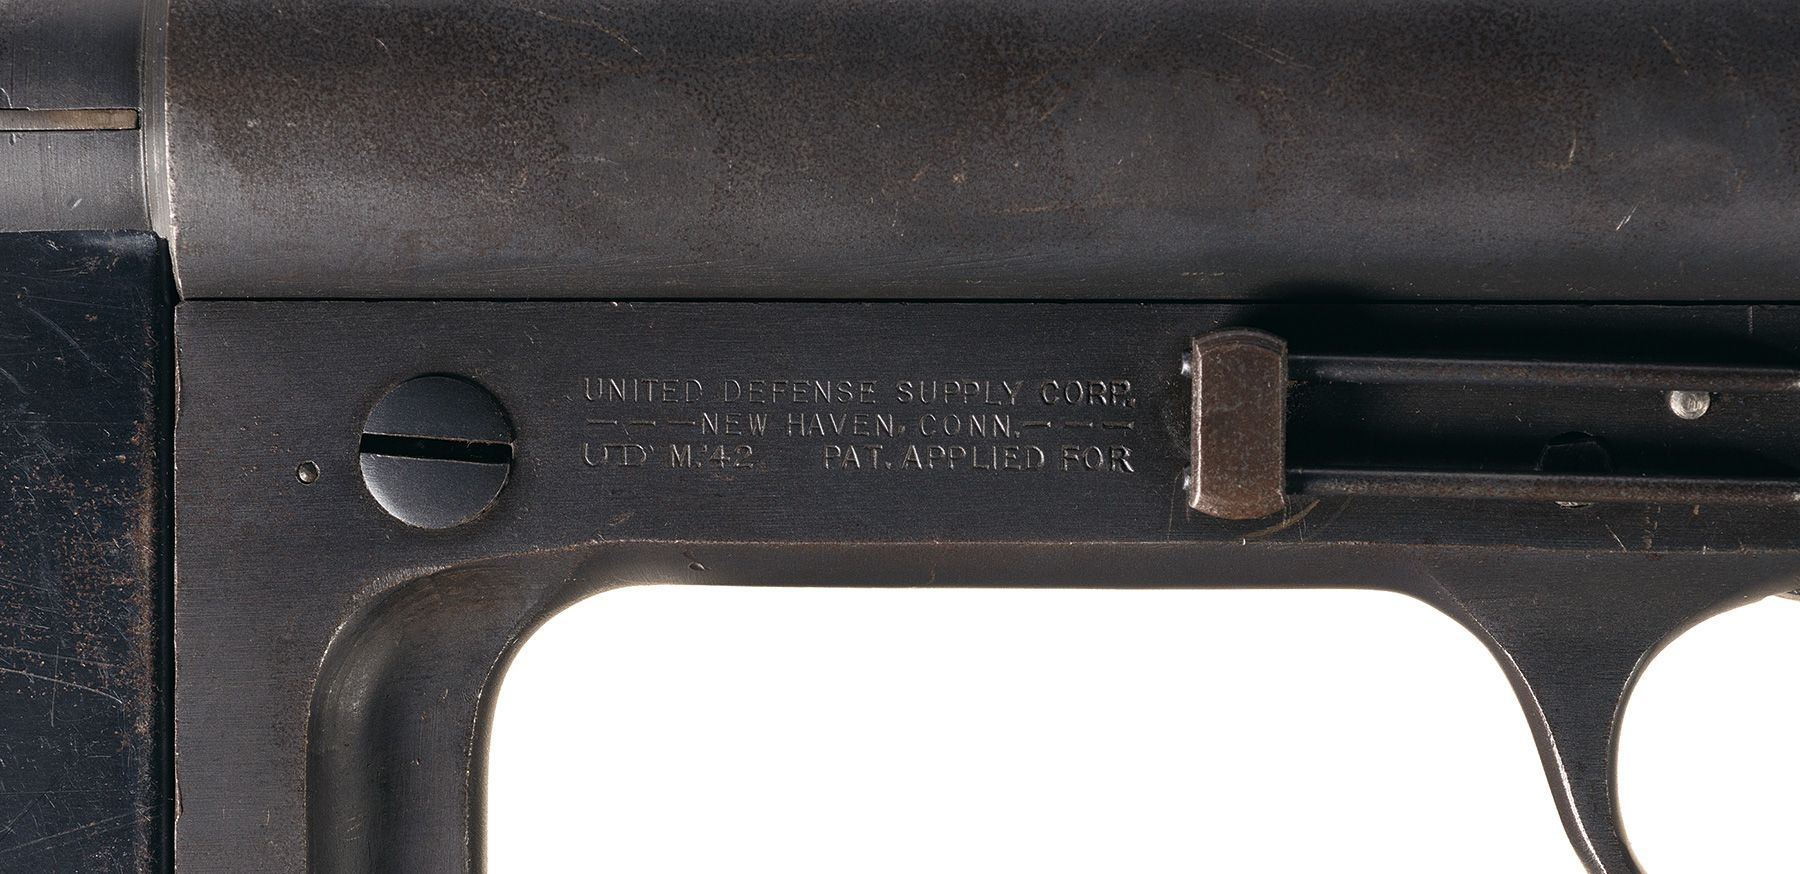 United Defense M42 sub-machine gun roll marks